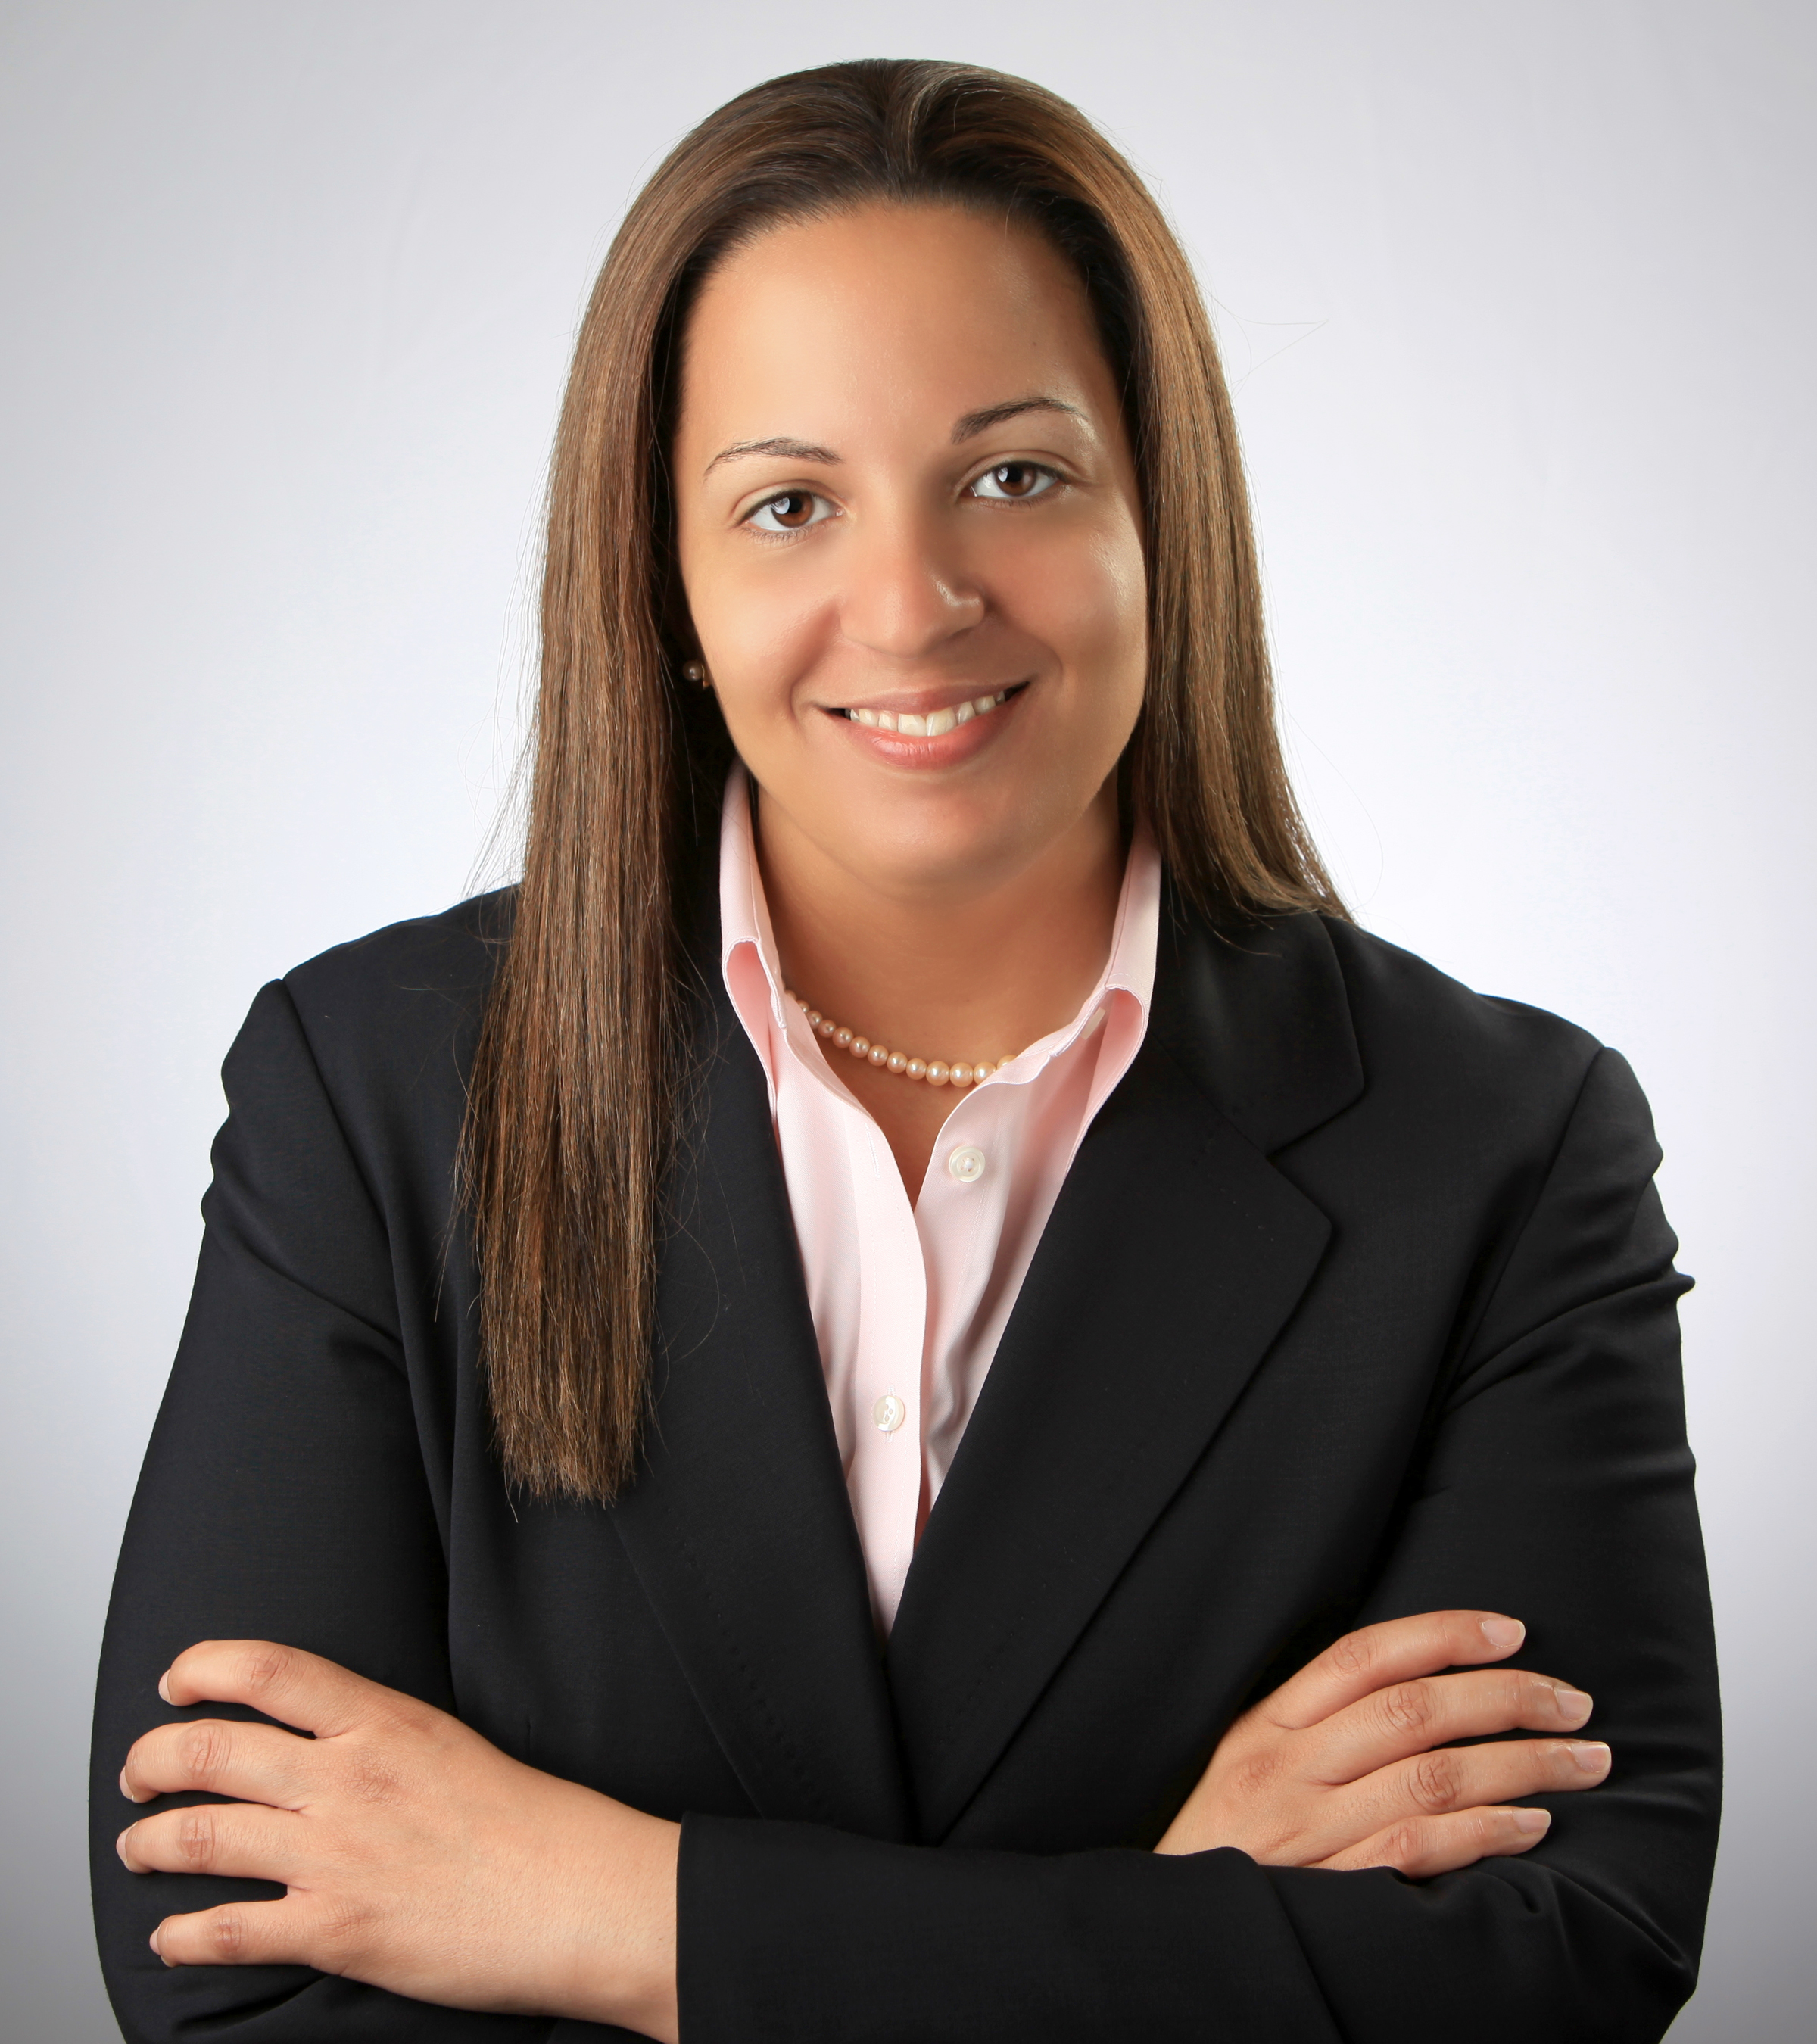 Melissa Thornton, CEO